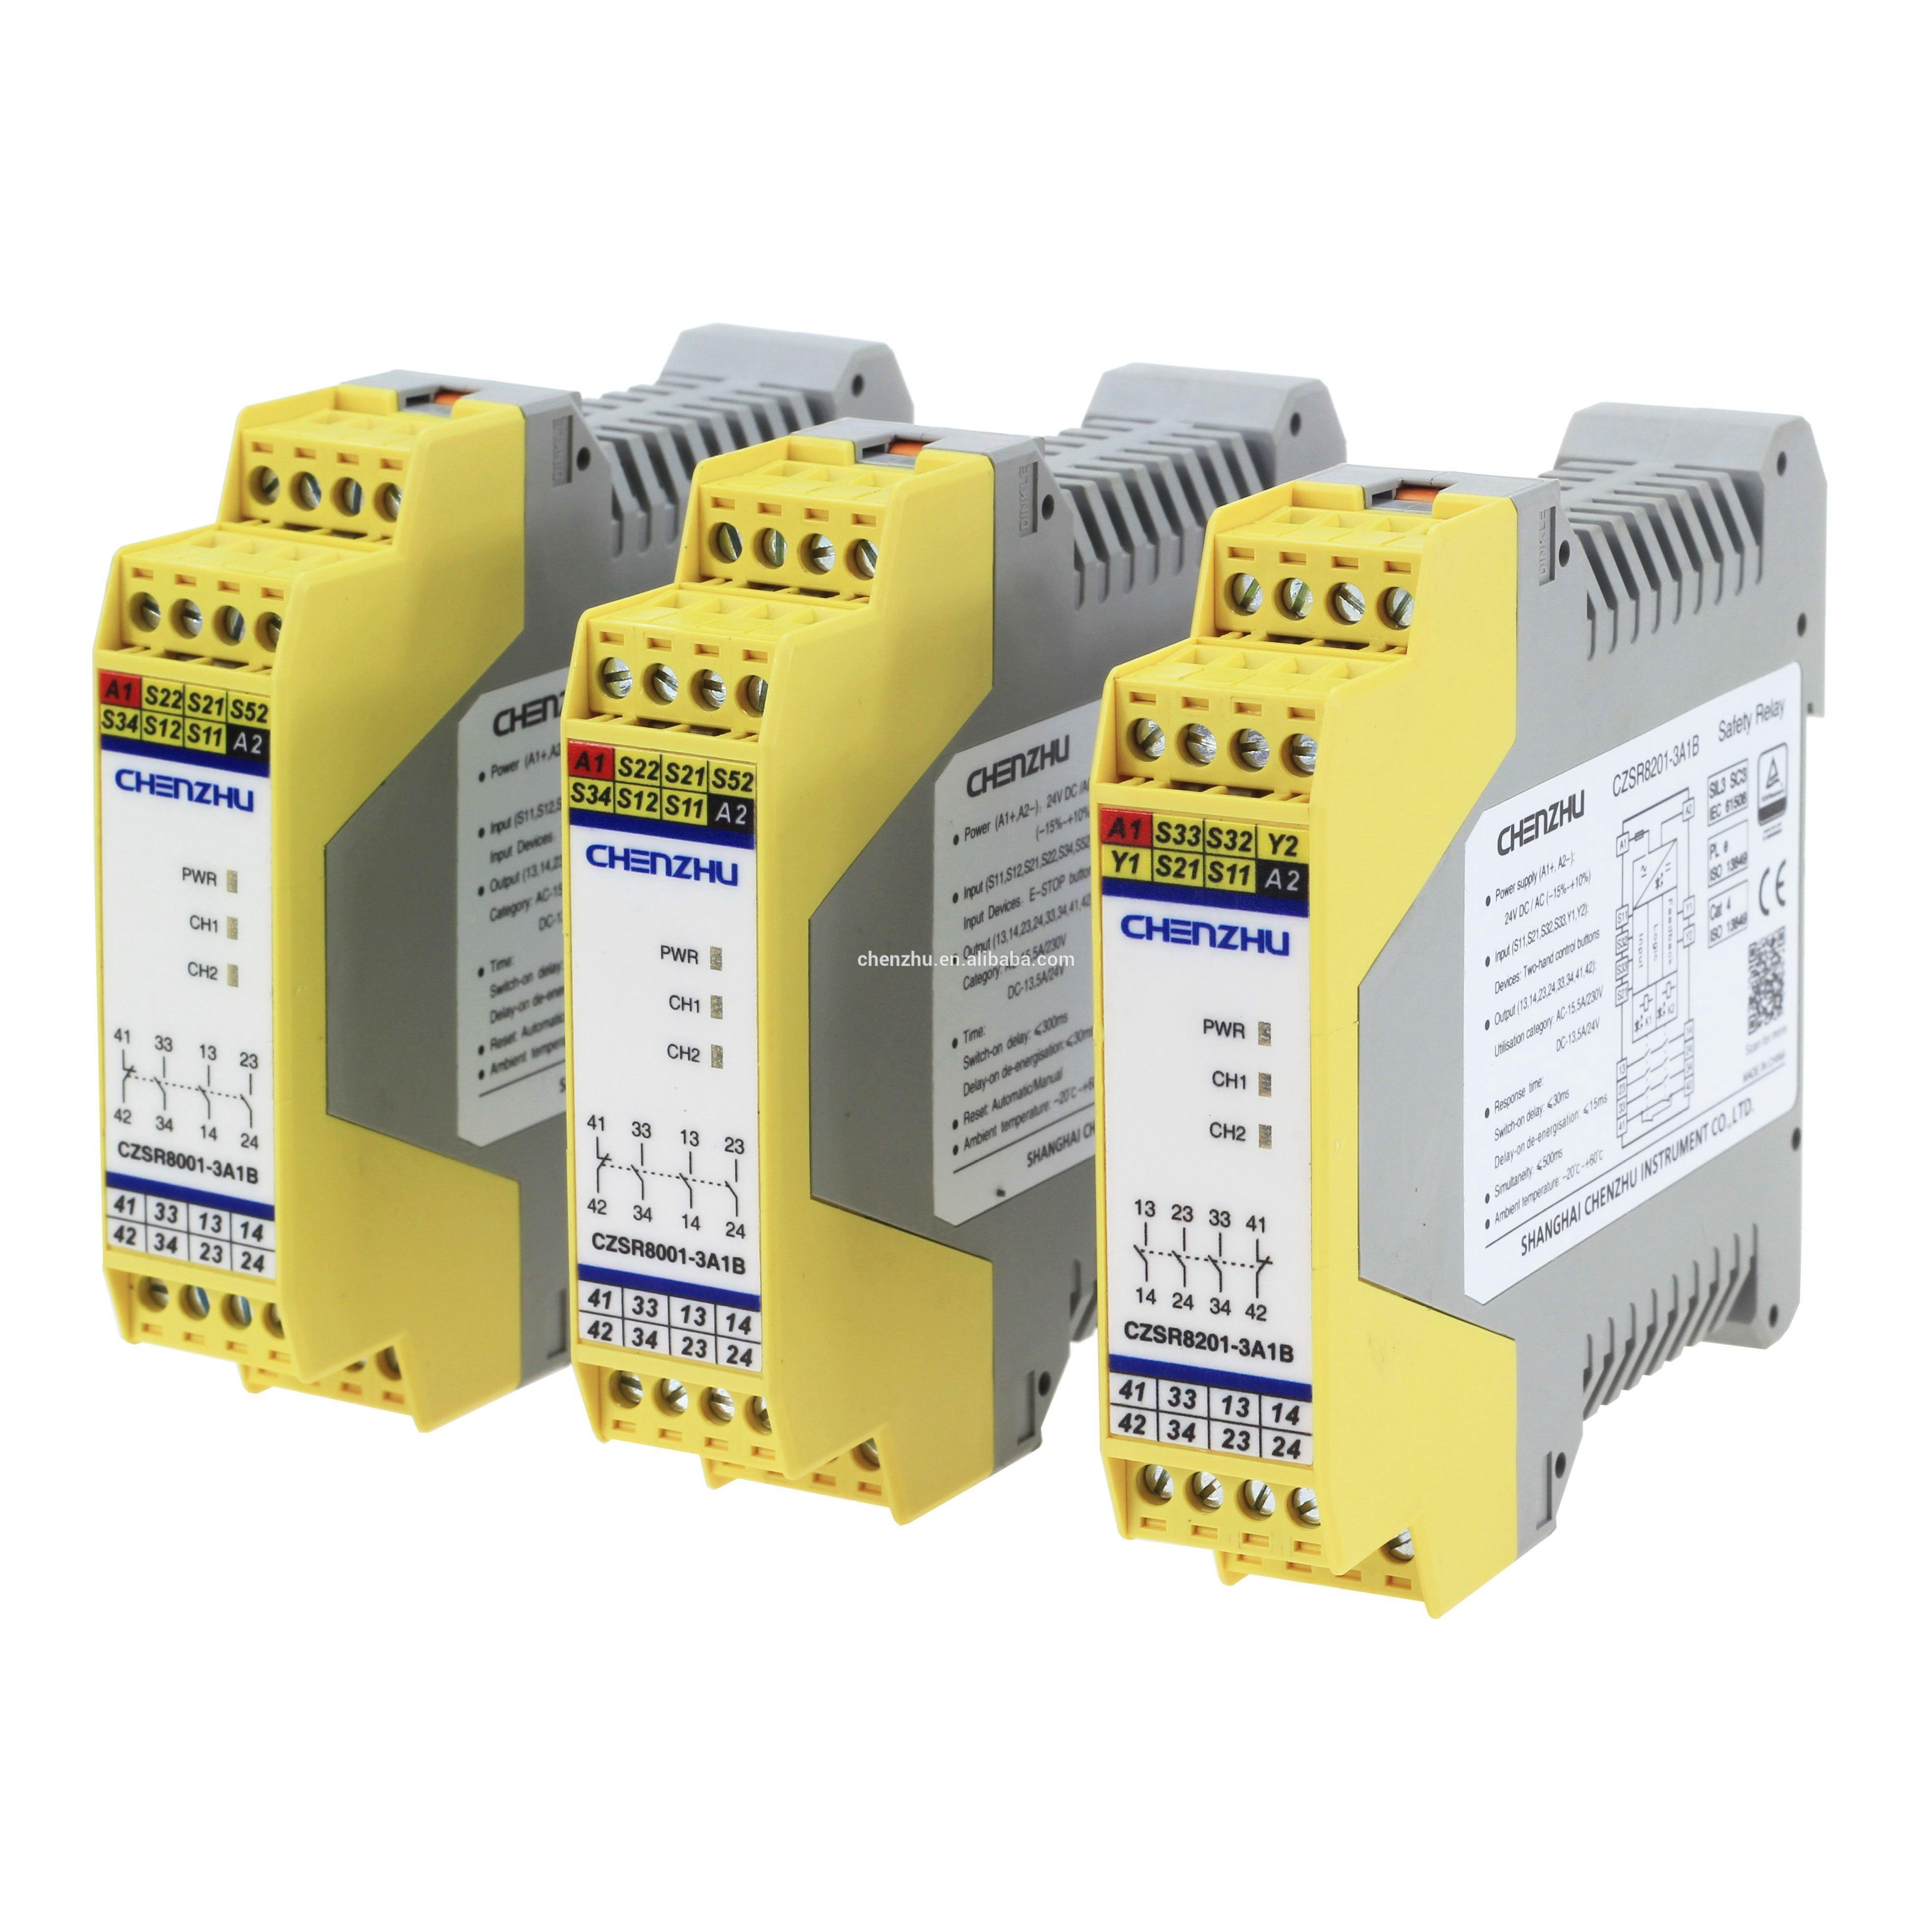 CZSR8001-2A2B-P PNP-نوع ضوء الستار سلامة التتابع | 24V DC | 2NO + 2NC | السيارات/دليل إعادة CHENZHU